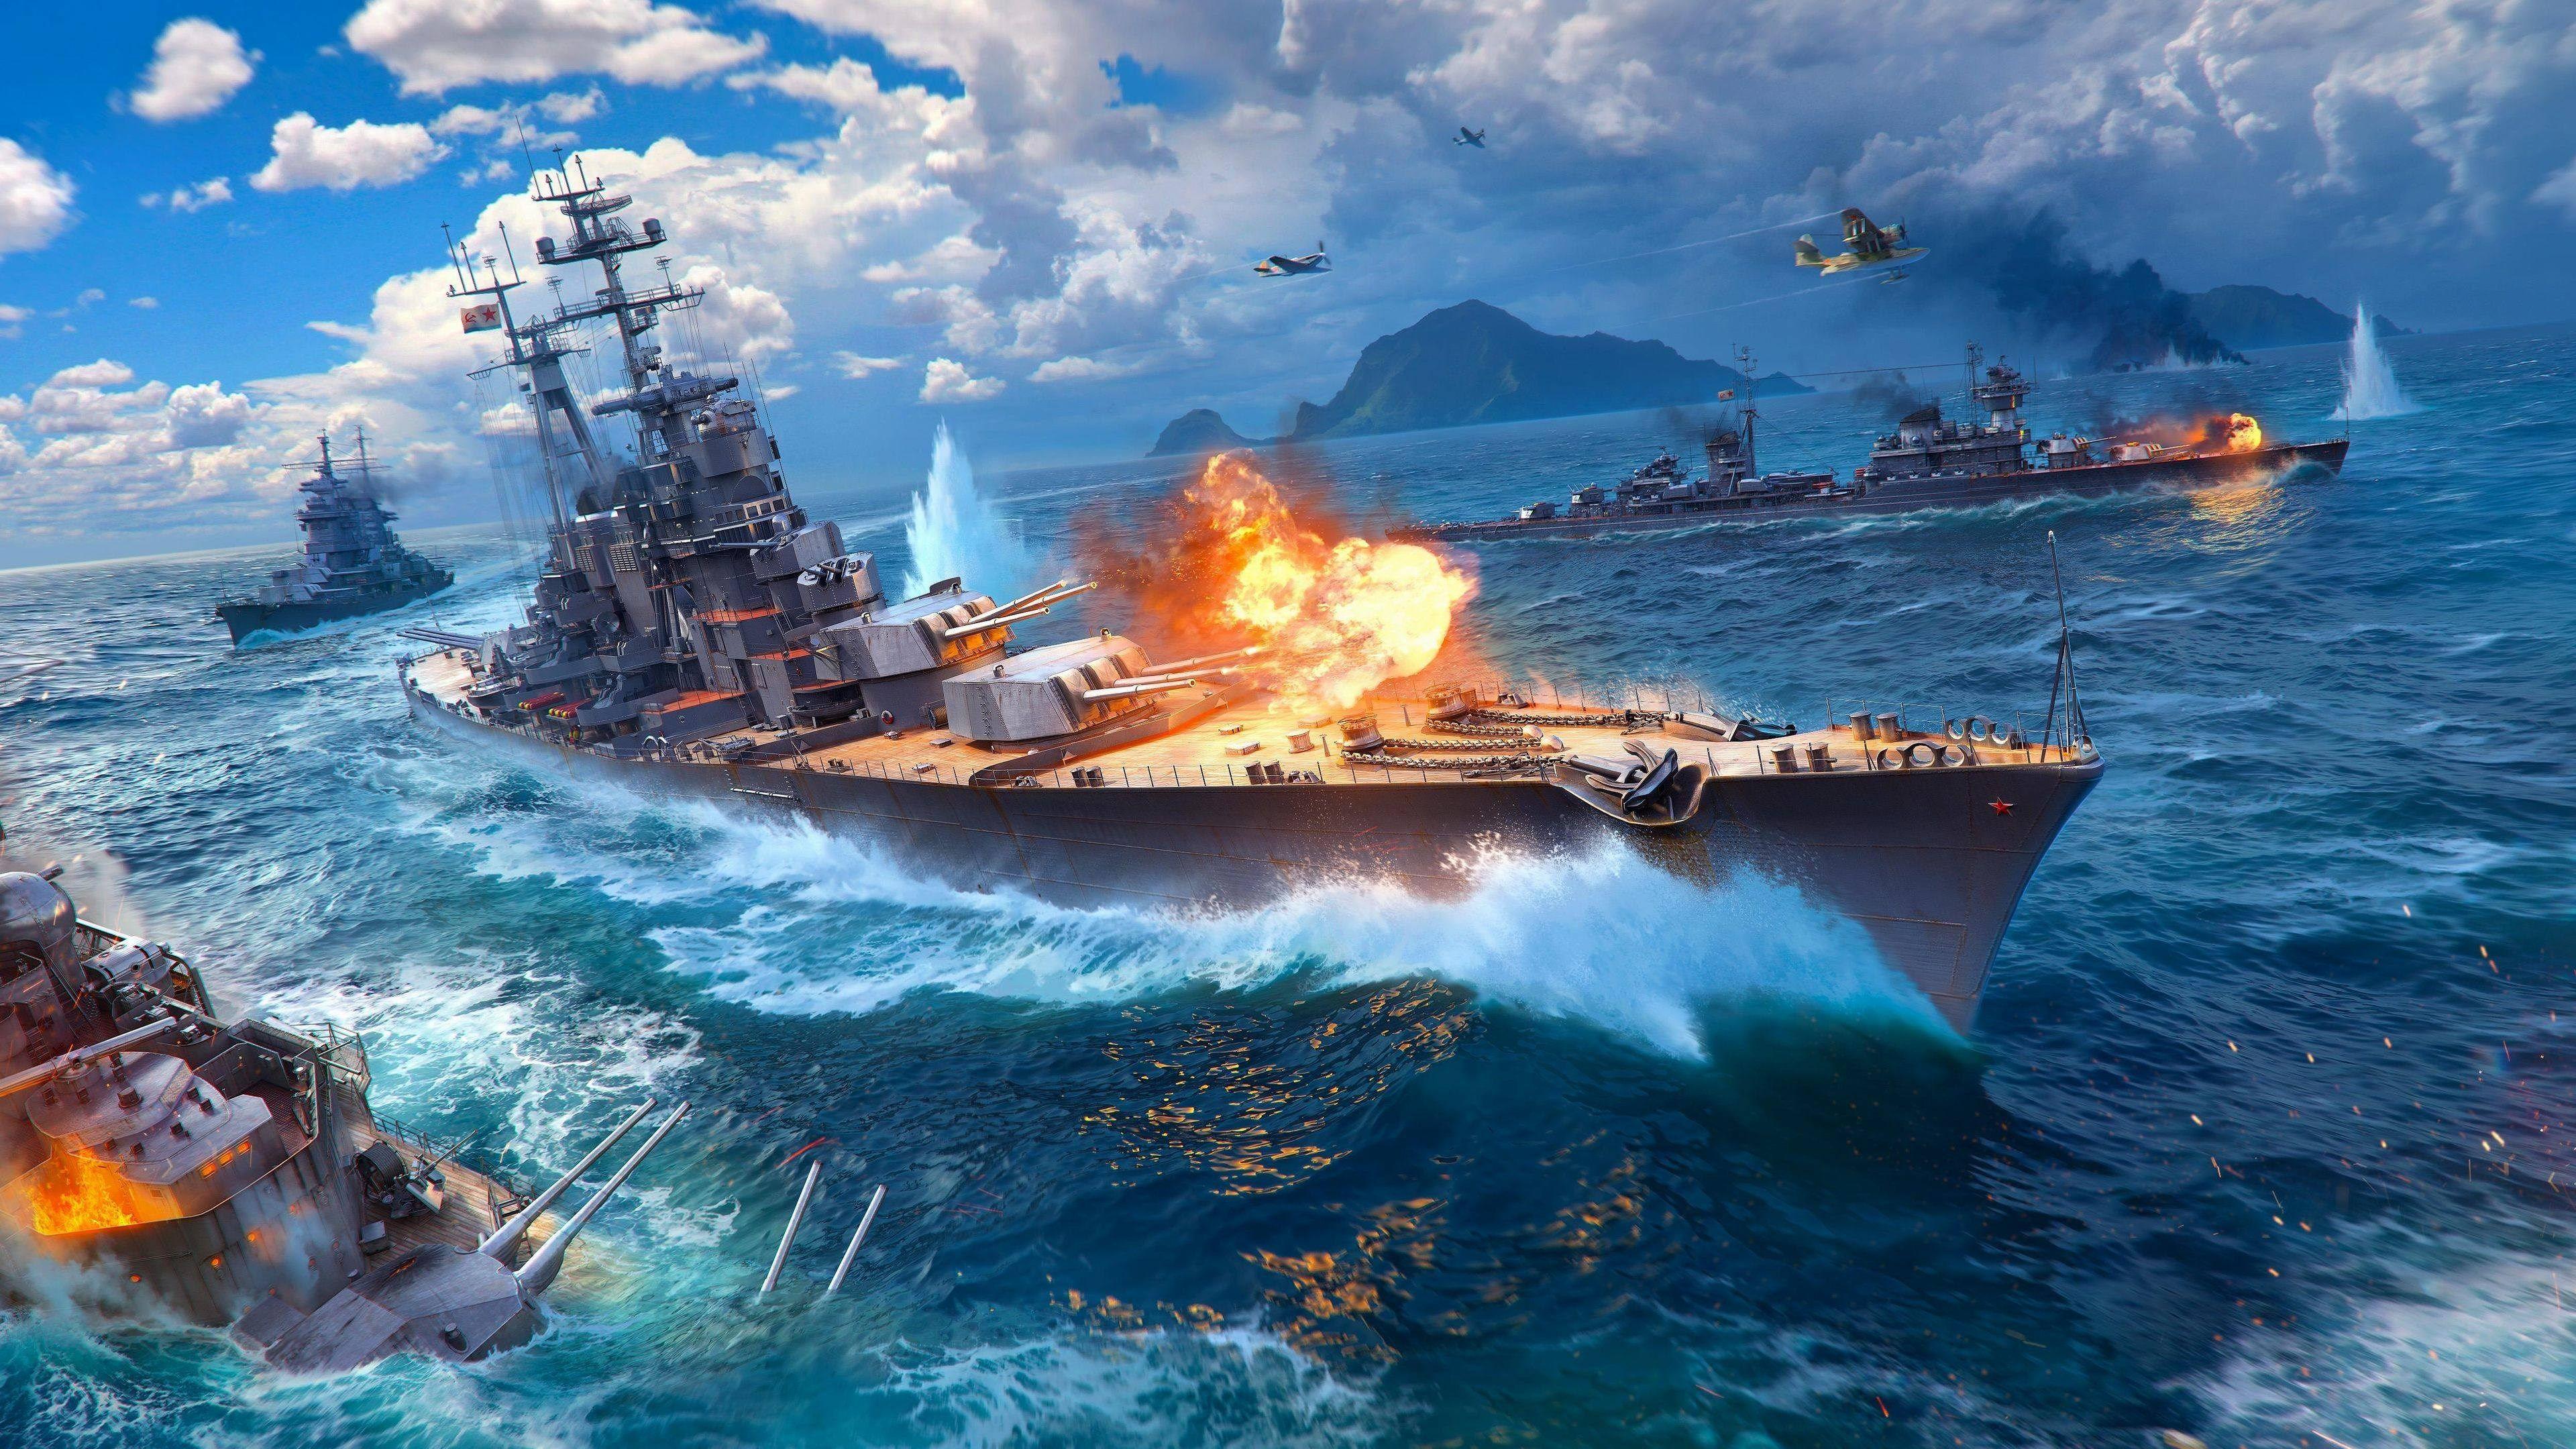 World Of Warship Game Wallpaper Free Download For Desktoptitlemeta Destroyer Wiring Diagram Namedescription Contentworld High Quality